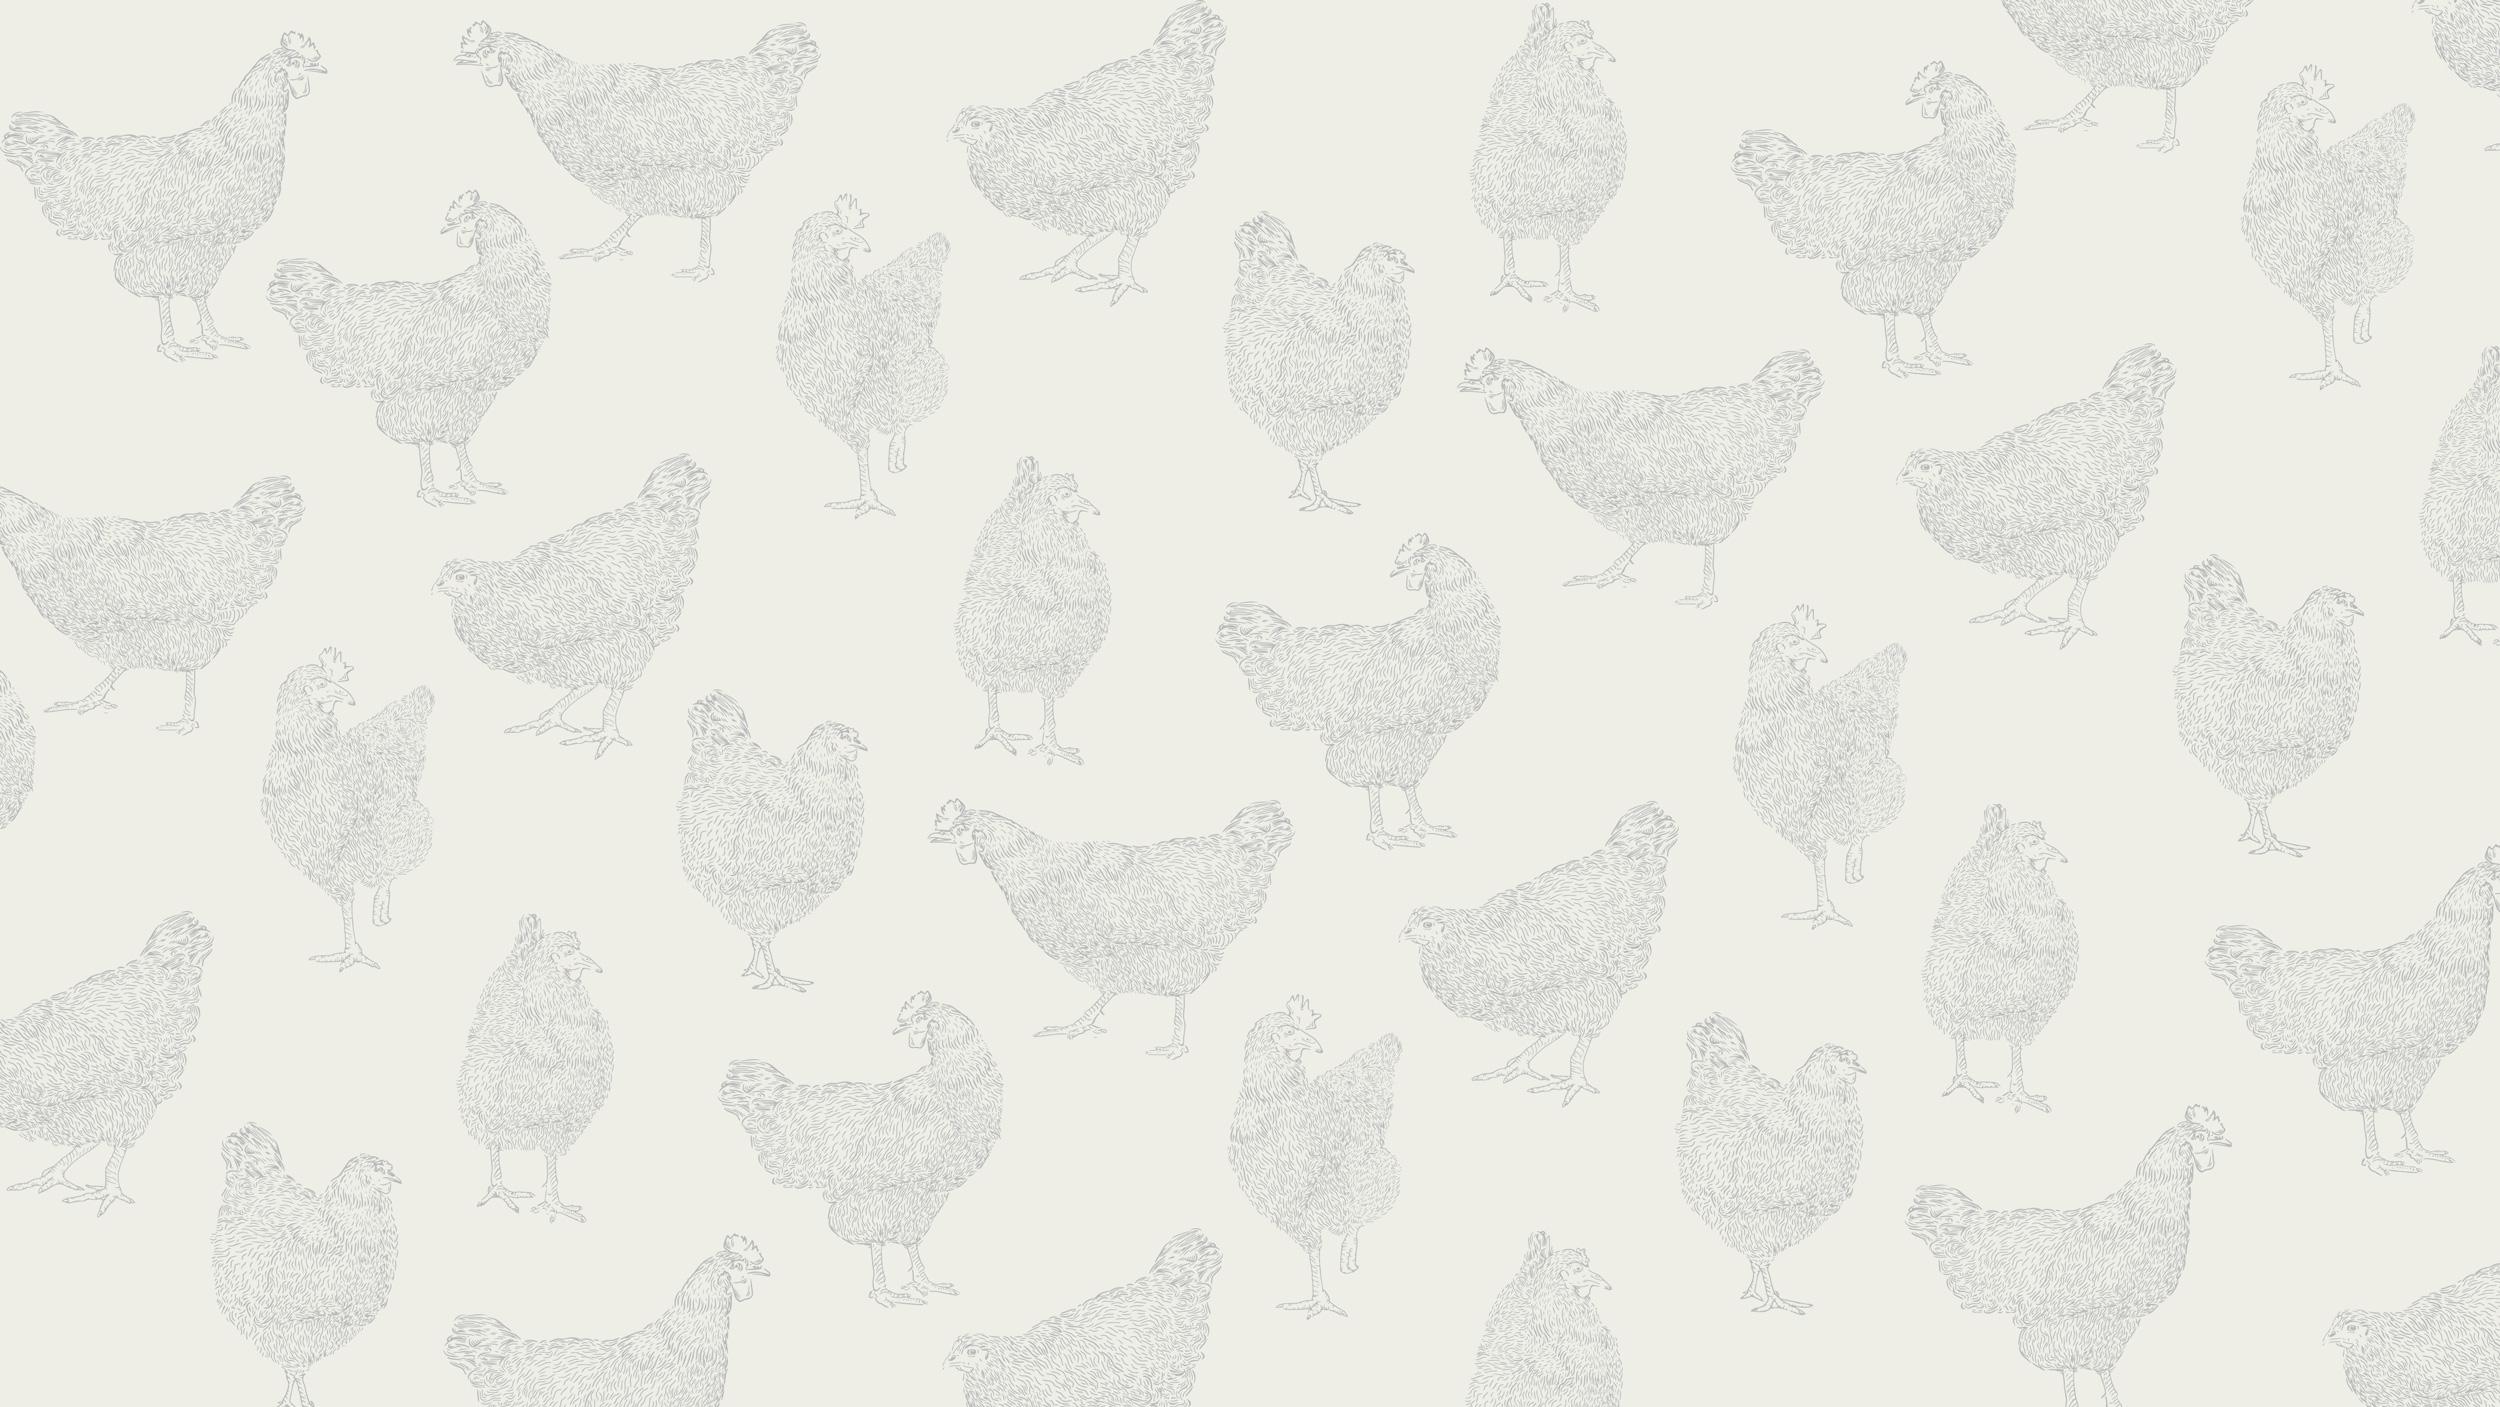 kamikaze-identidad-corporativa-huevos-ecologicos-cardenillo-13